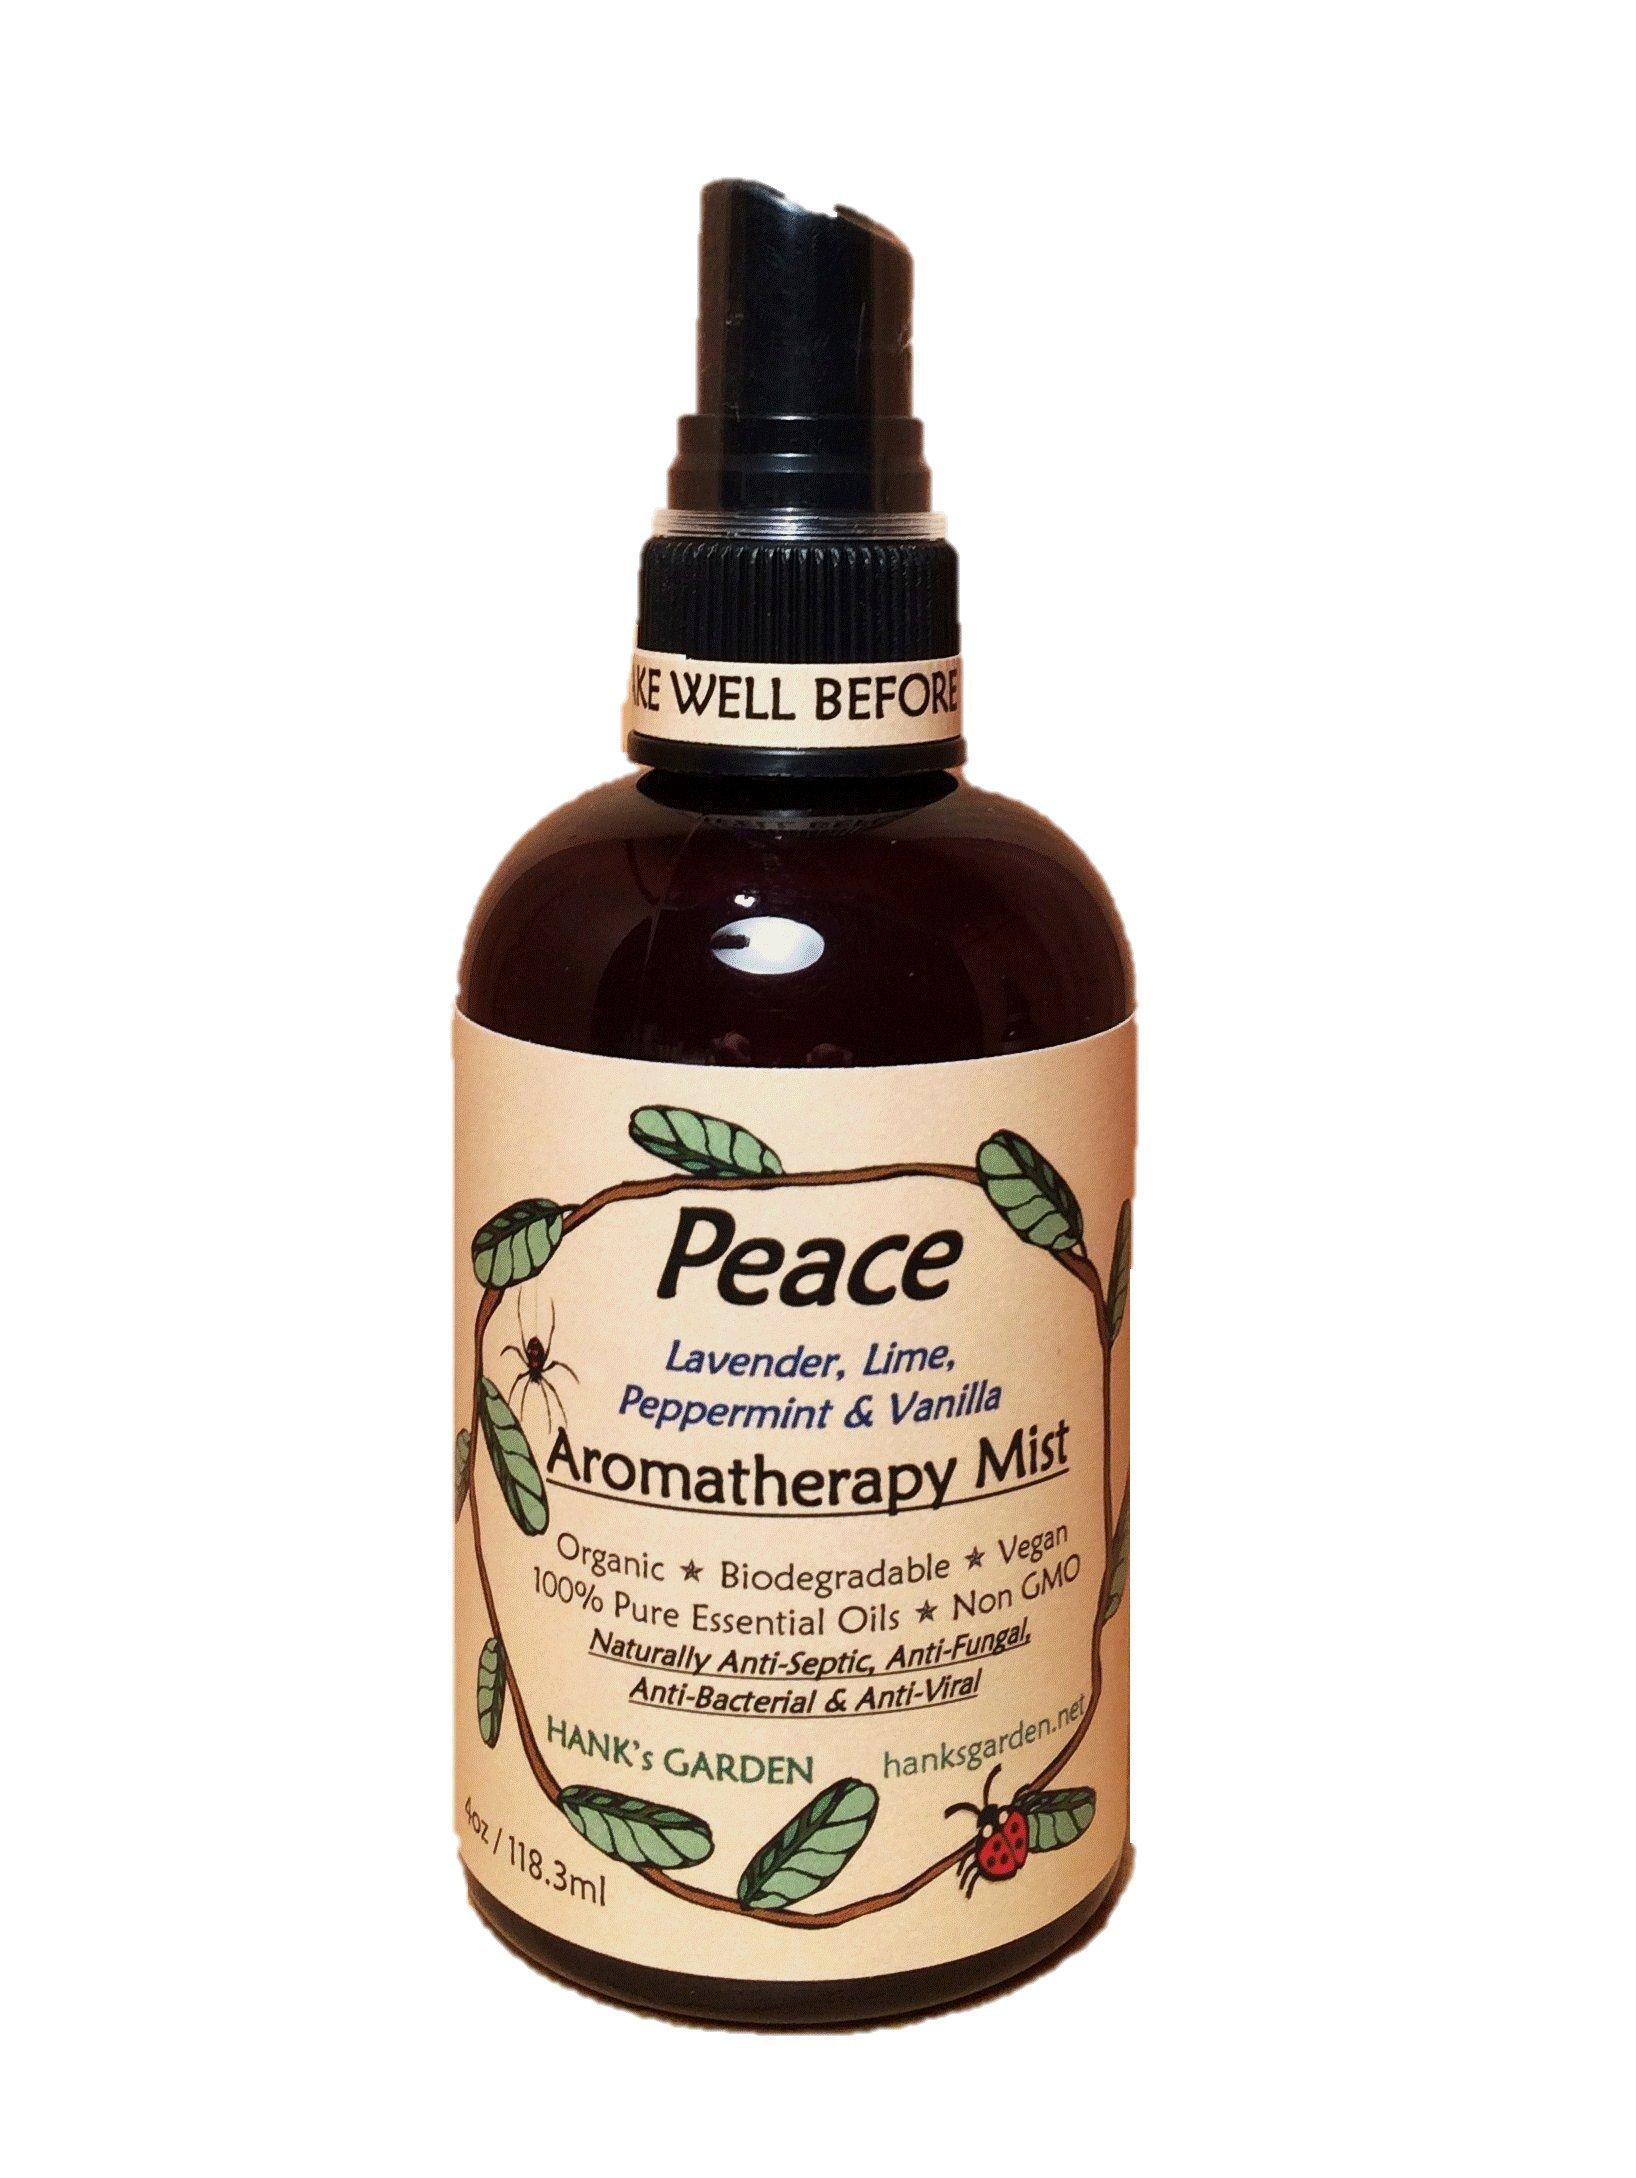 Peace Aromatherapy Body & Room Spray Mist-All Natural Earth Friendly - Vegan-Organic-Non GMO-Essential Oils of Lavender, Lime, Peppermint & Vanilla - (8 oz)